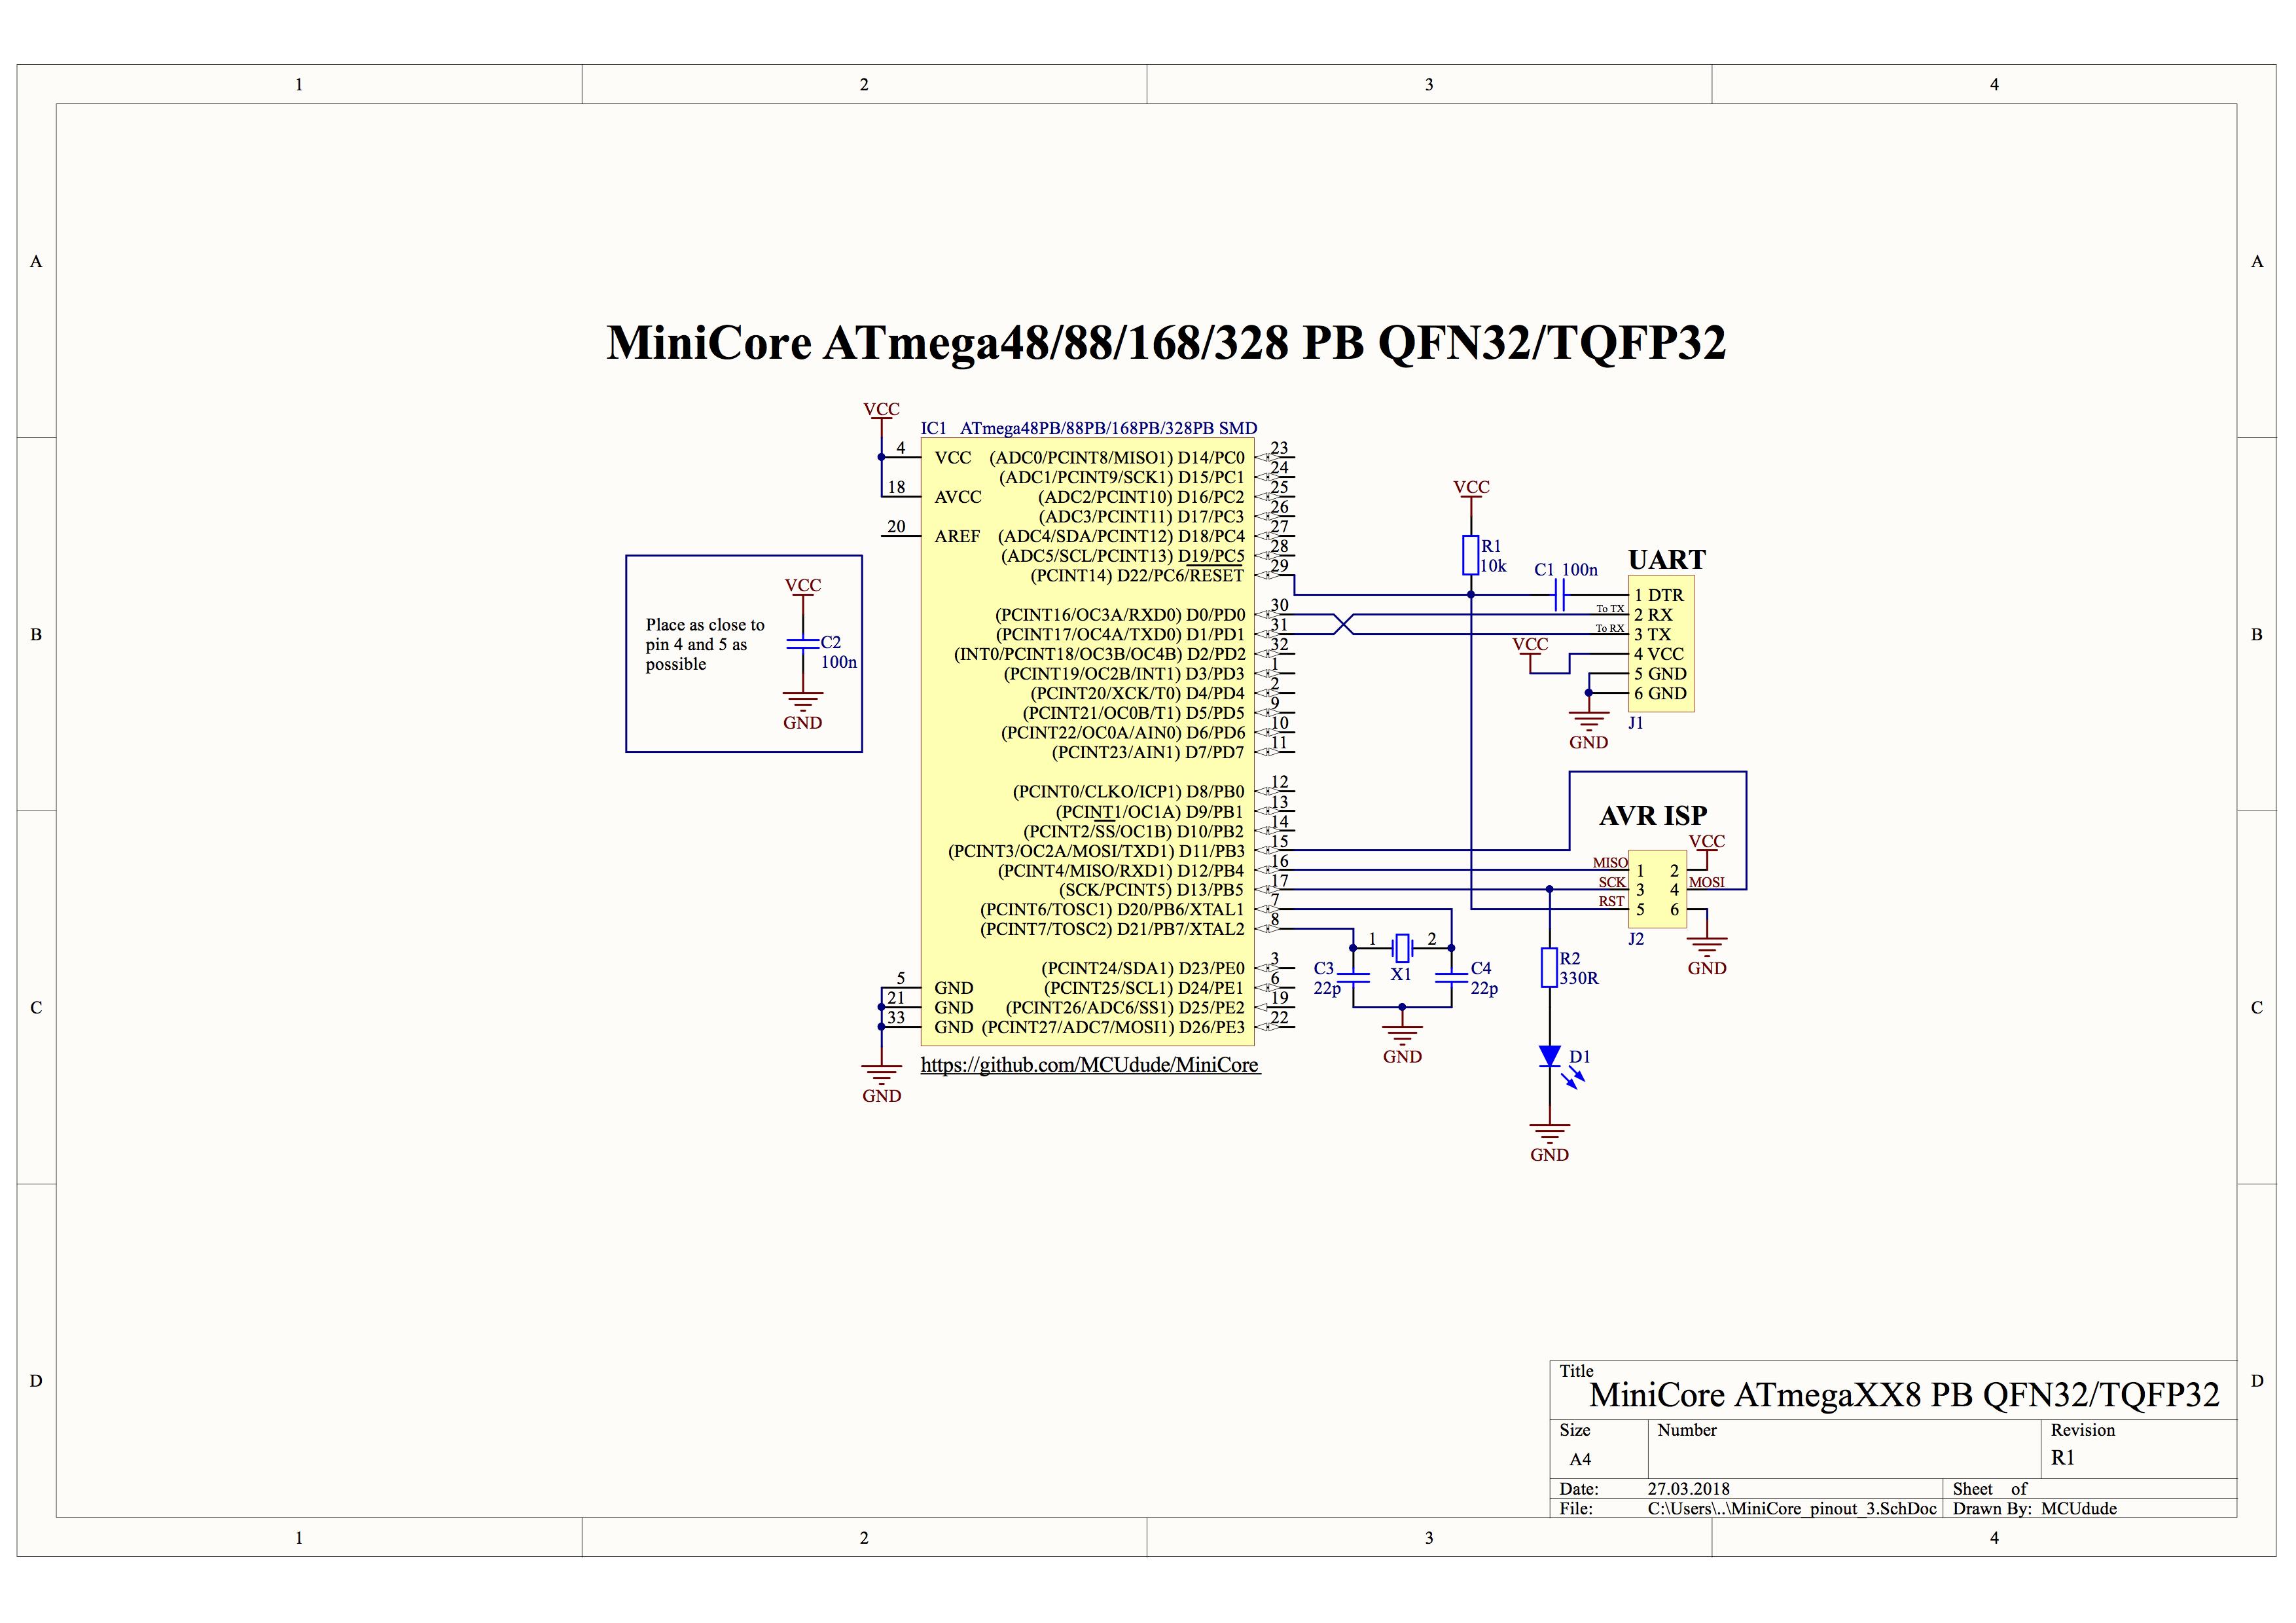 GitHub - MCUdude/MiniCore: Arduino hardware package for